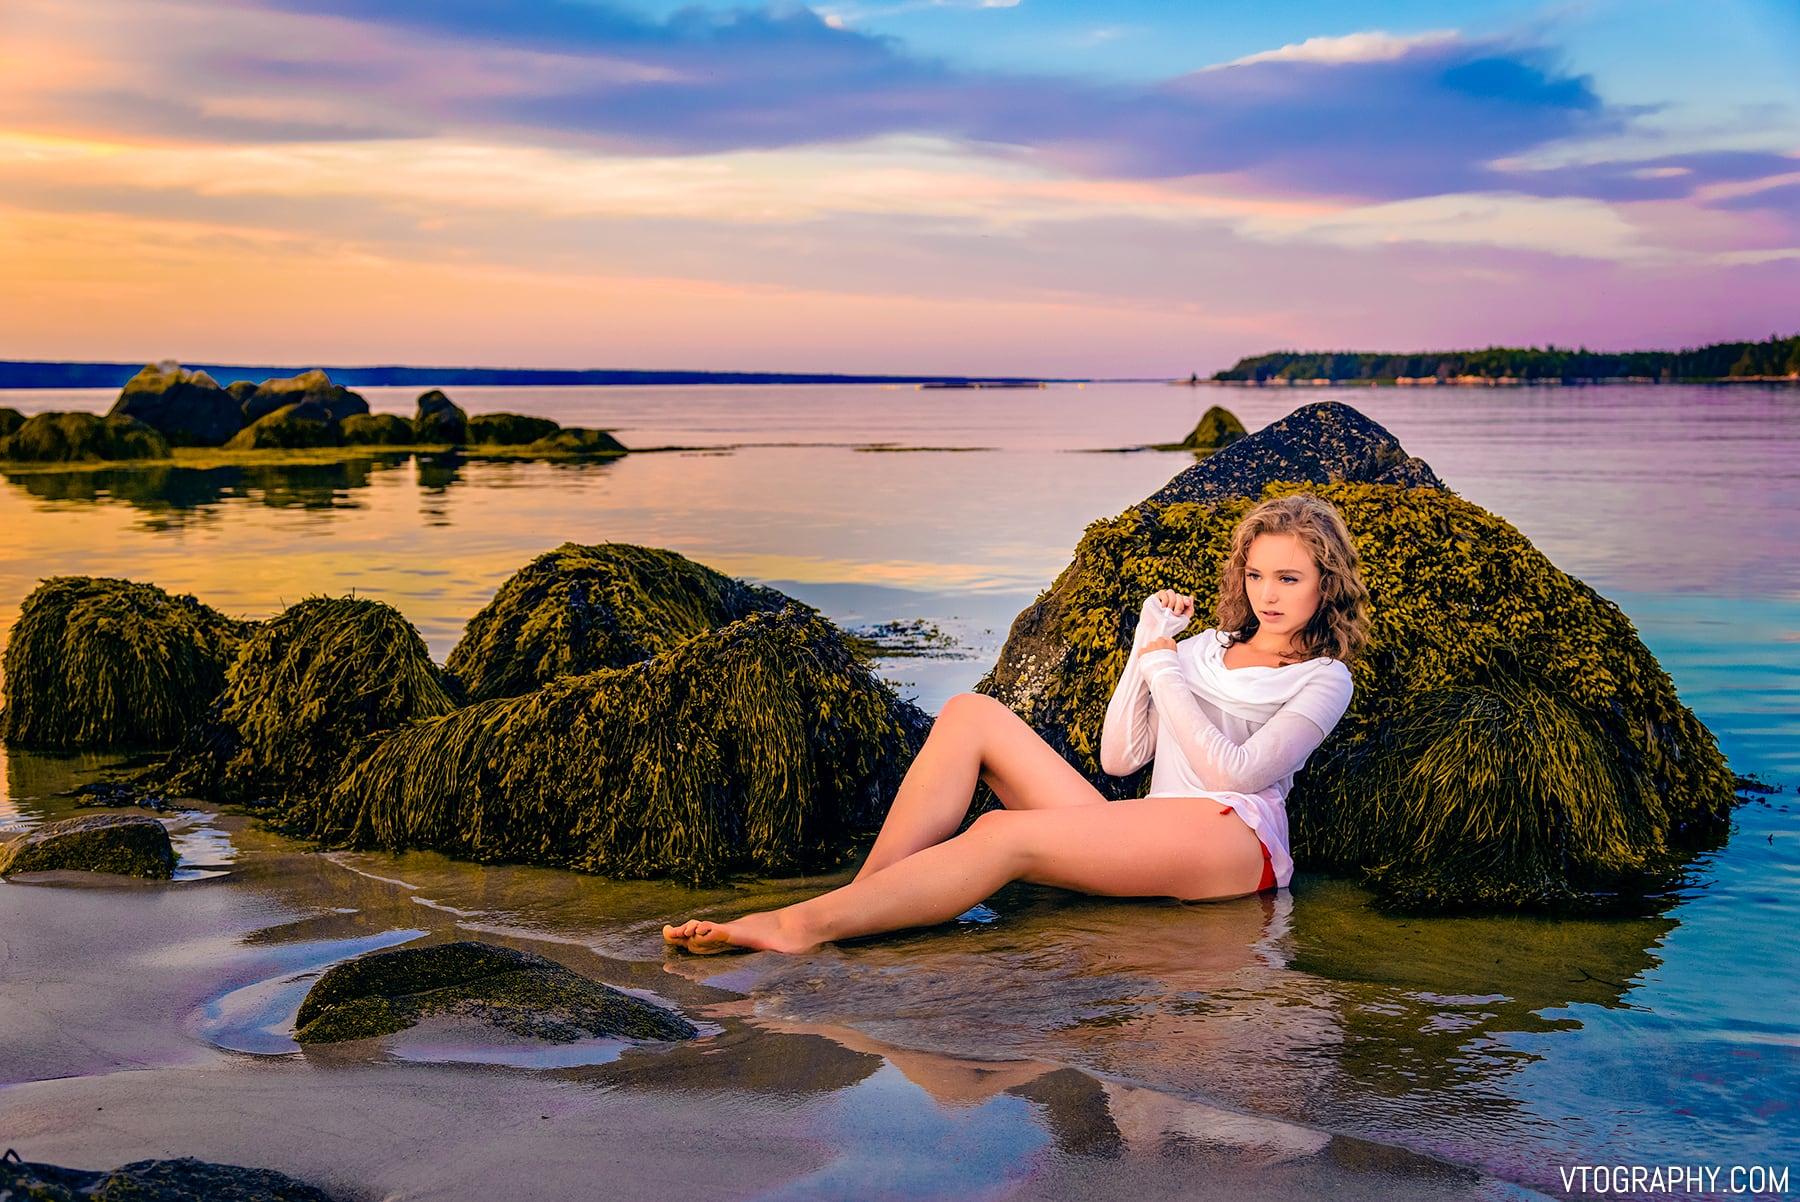 Carters Beach, Nova Scotia photo shoot with model Kathryn